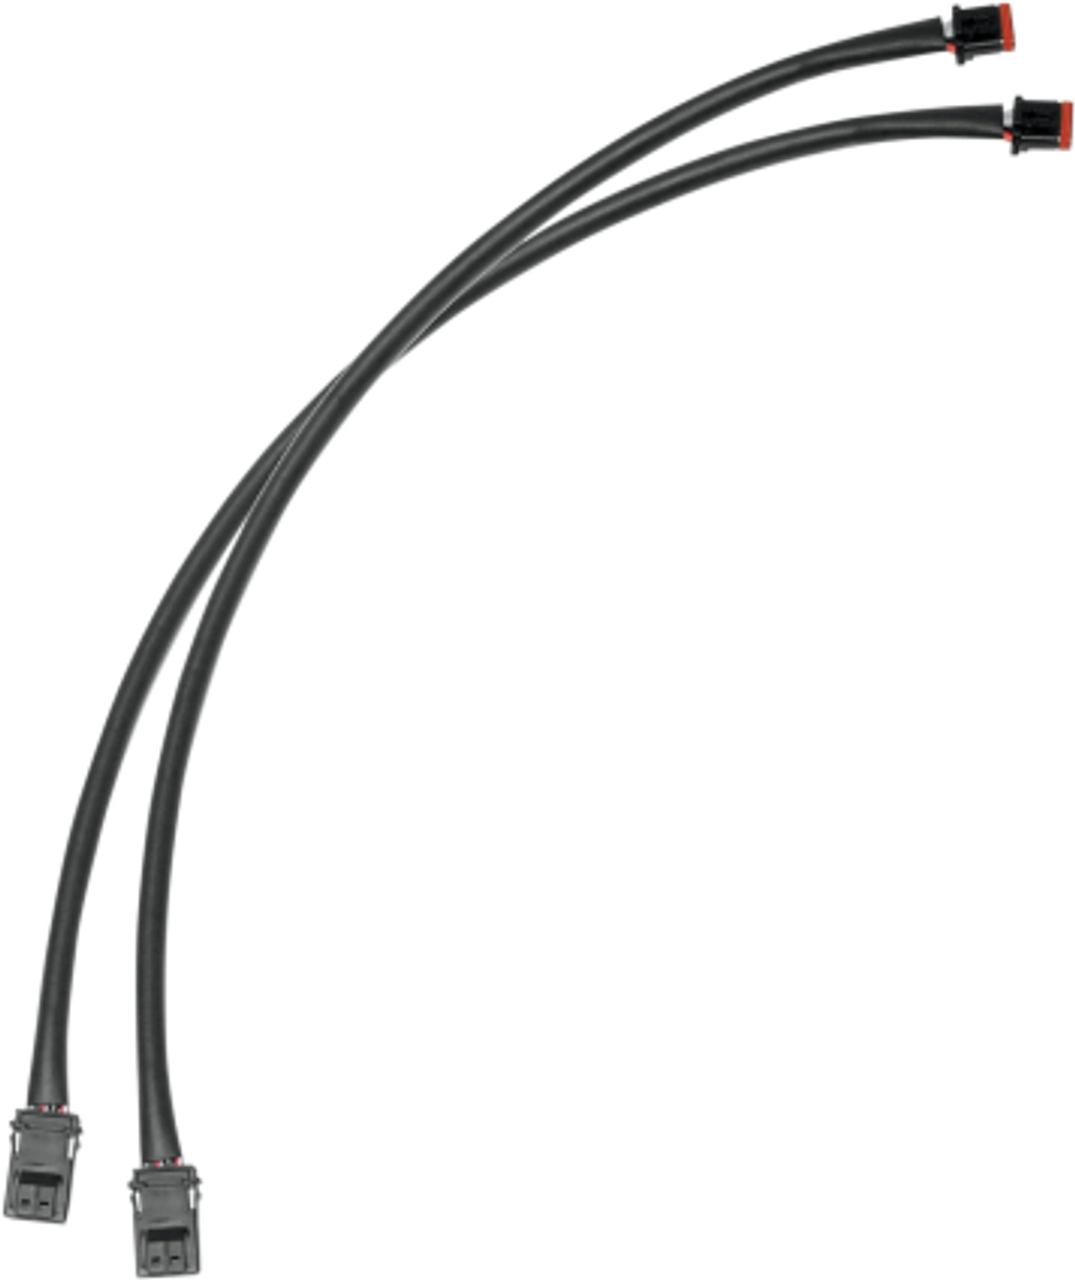 HANDLEBAR WIRE EXTENSION KIT HARLEY SOFTAIL FLST FLSTC HERITAGE CLASSIC 96-06